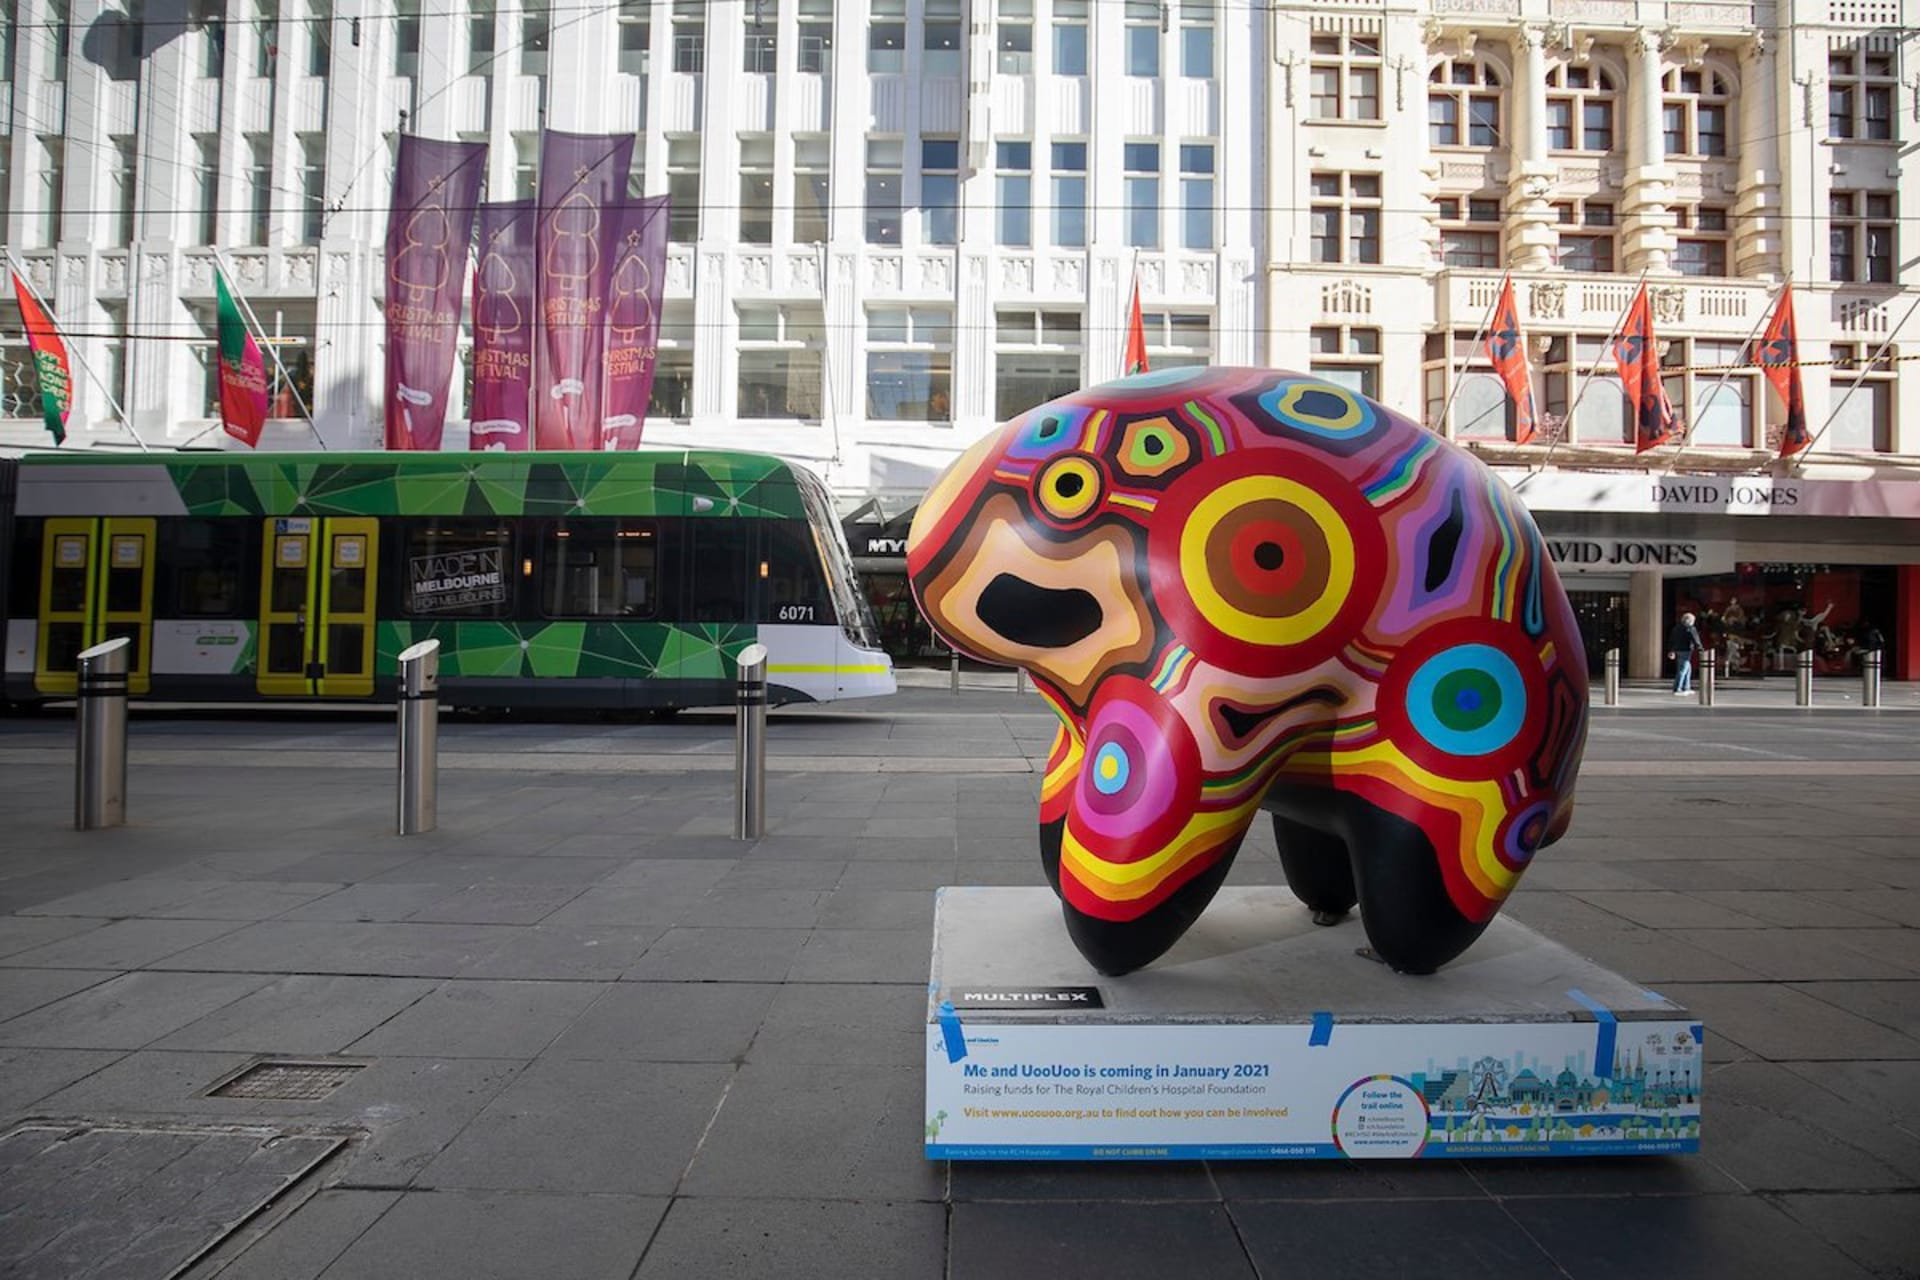 Melbourne - Art Special: Melbourne's Colourful UooUoo Trail - Part 4